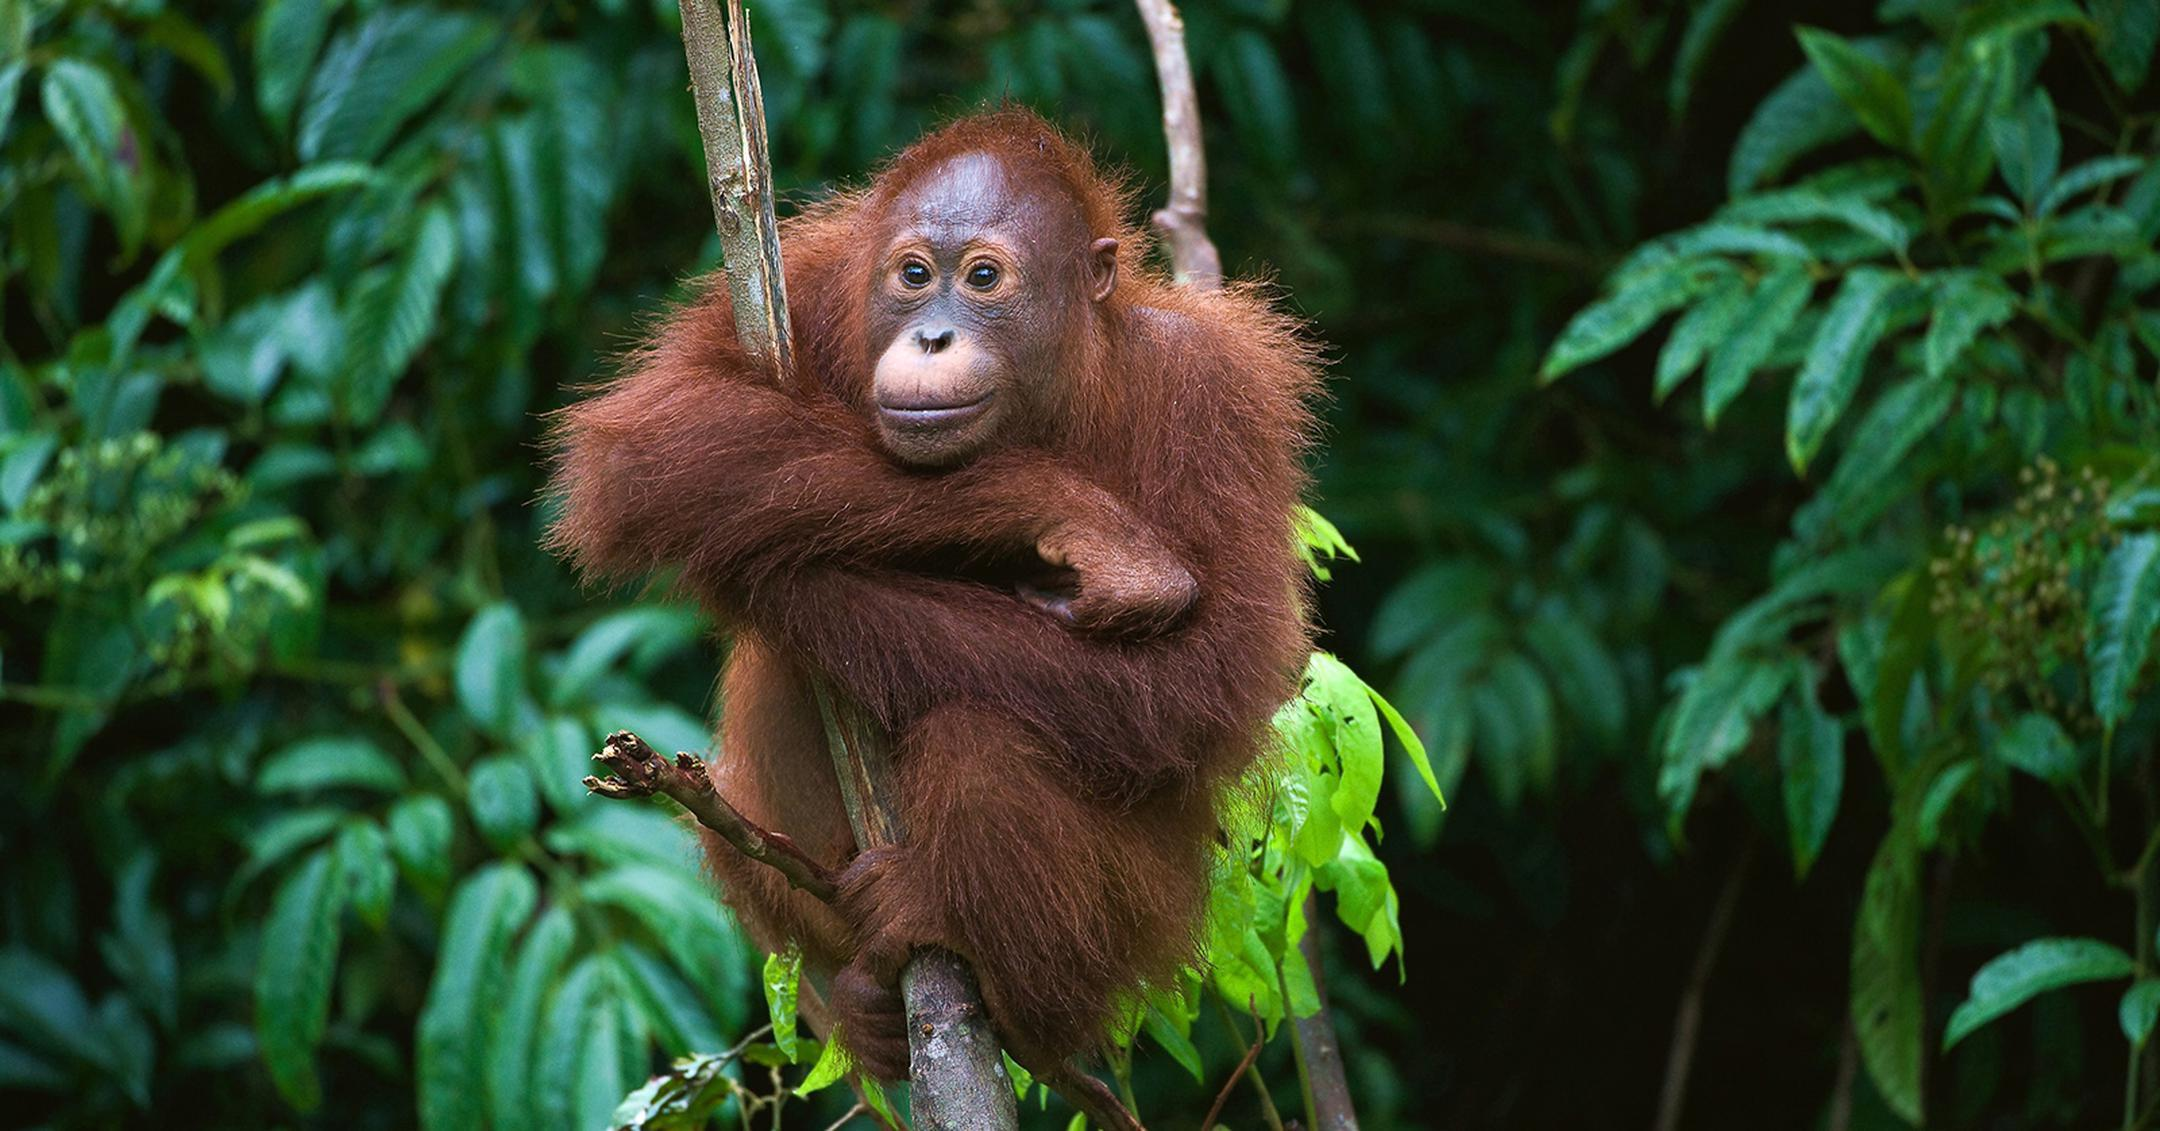 Orangutans2-1536087034935-1536087037048-1538089752019-1538089754458.jpg